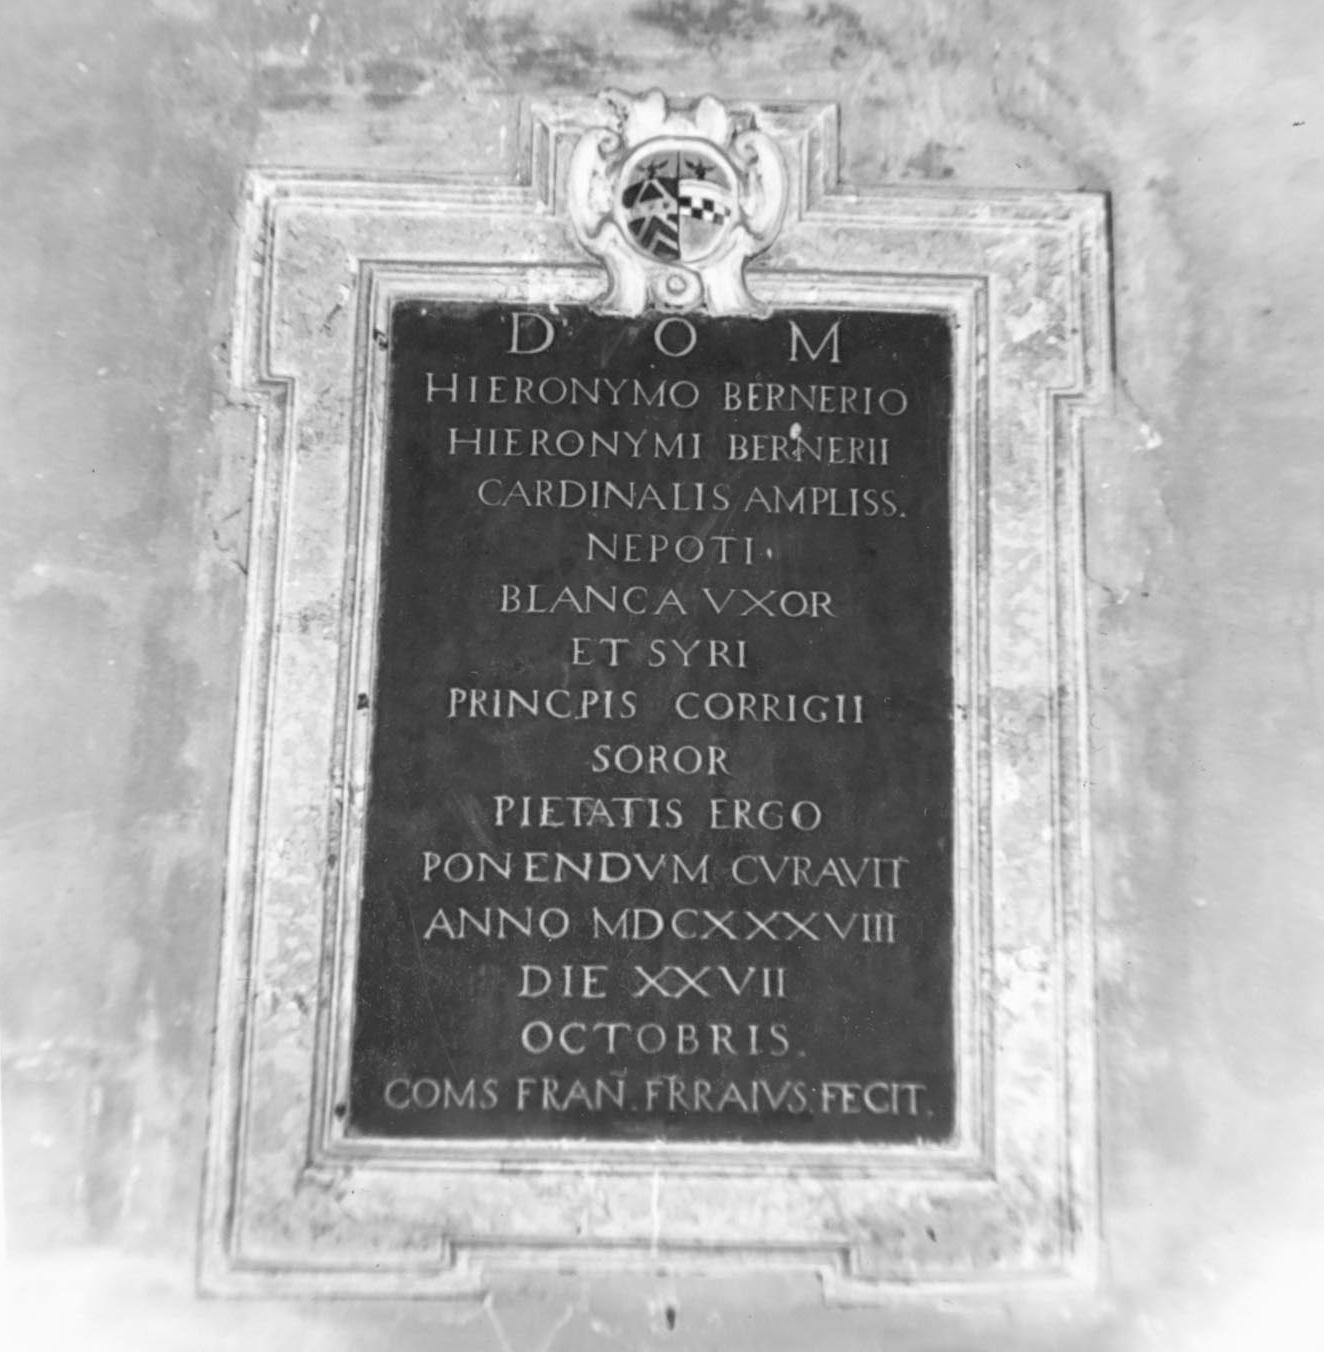 lapide tombale - bottega emiliana (sec. XVII)